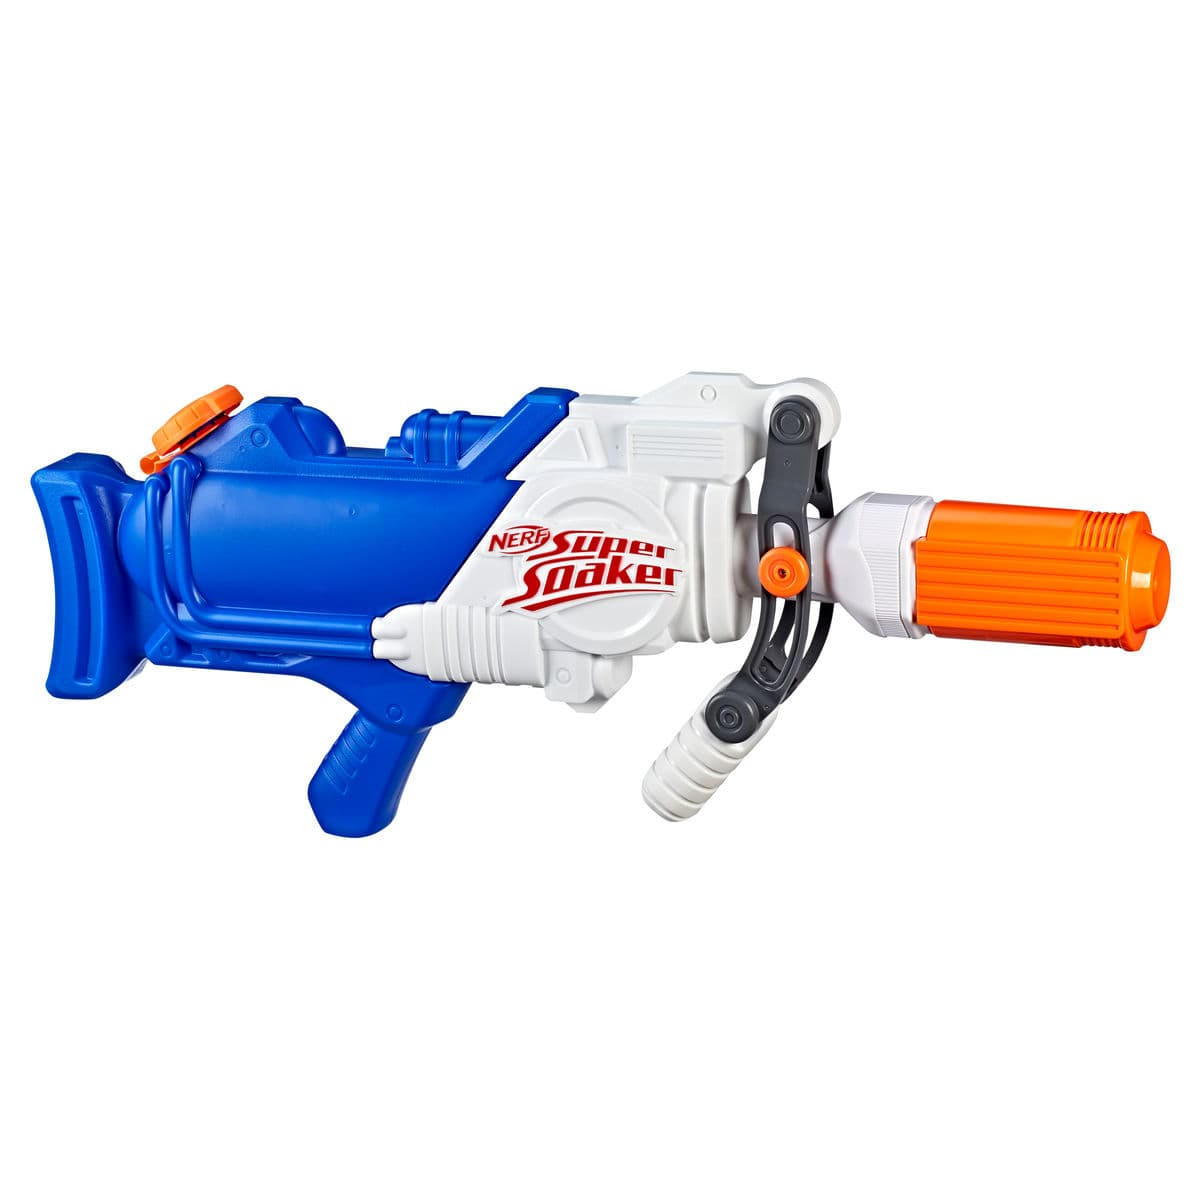 Nerf Super Soaker Hydra Blaster